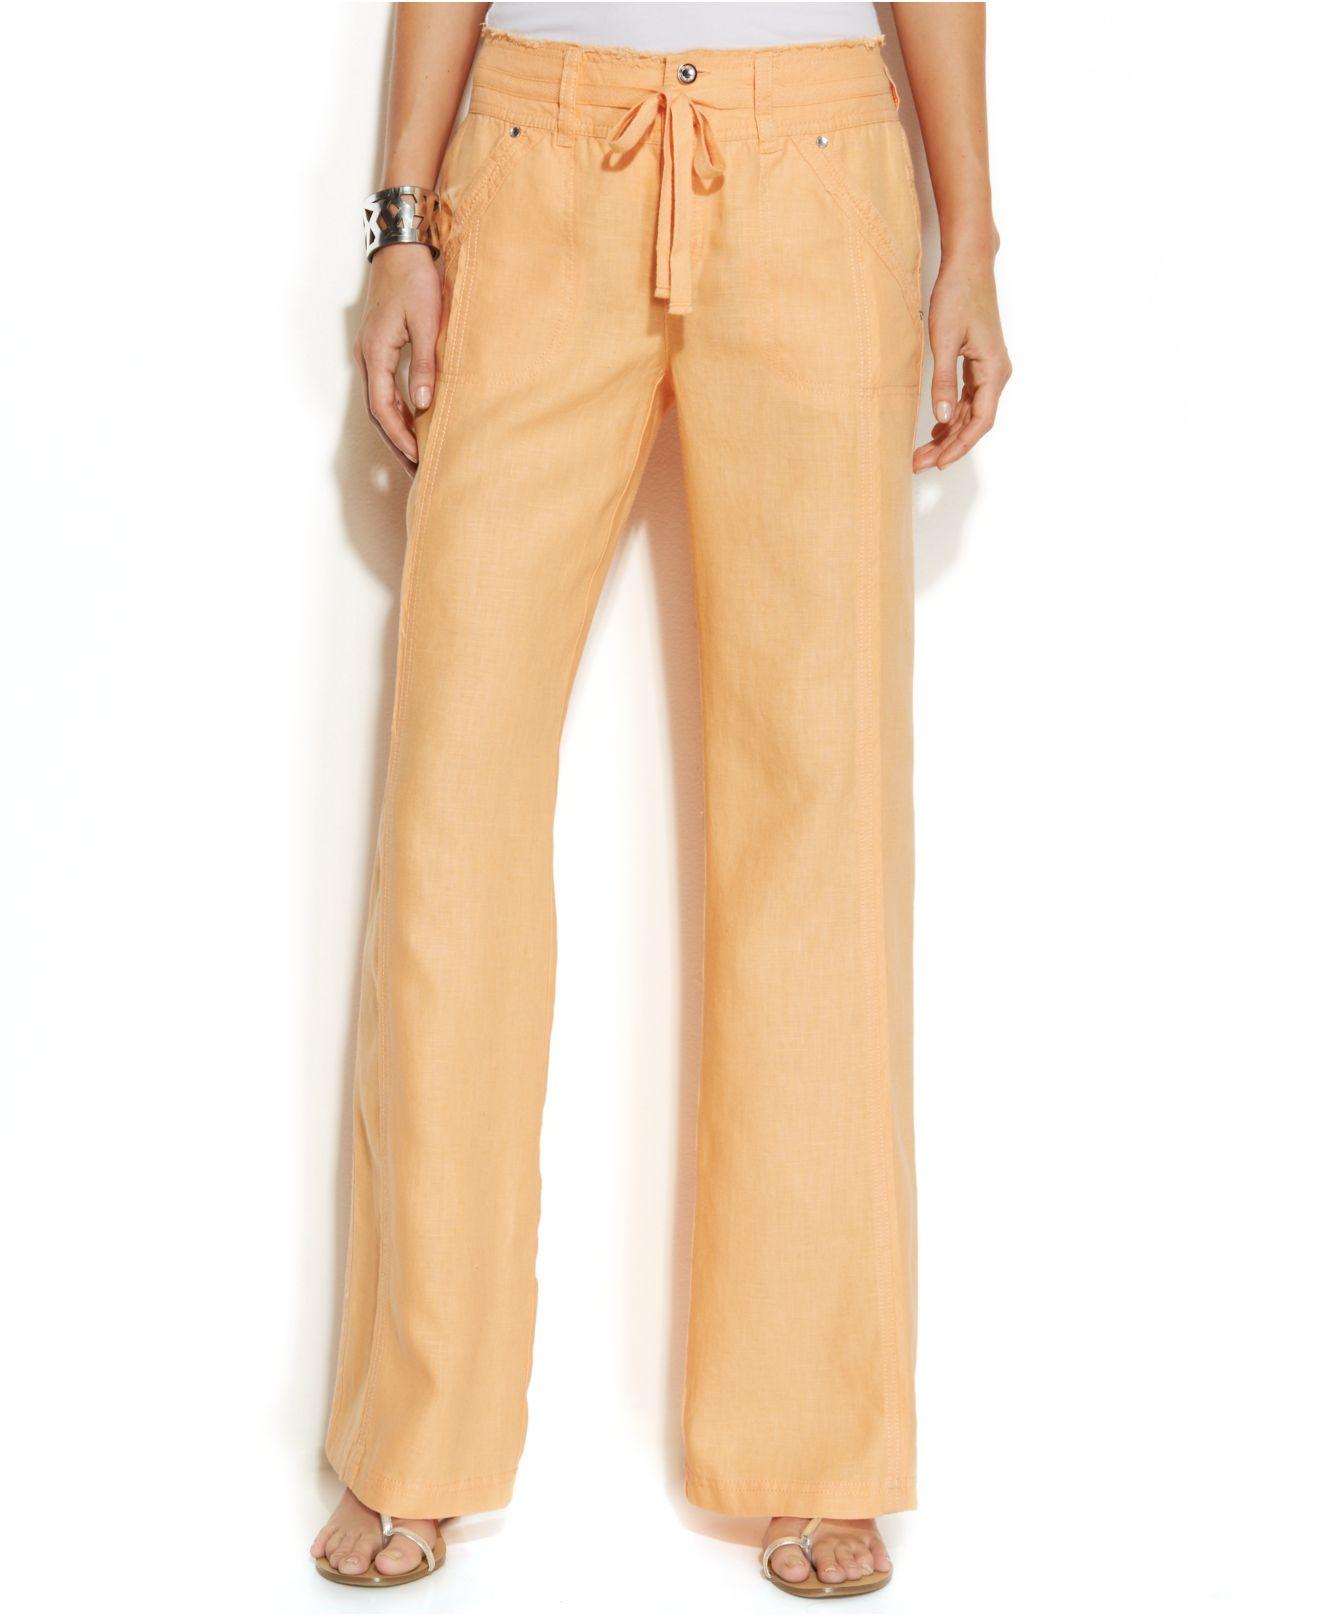 Inc international concepts Wide-Leg Linen Pants in Orange | Lyst